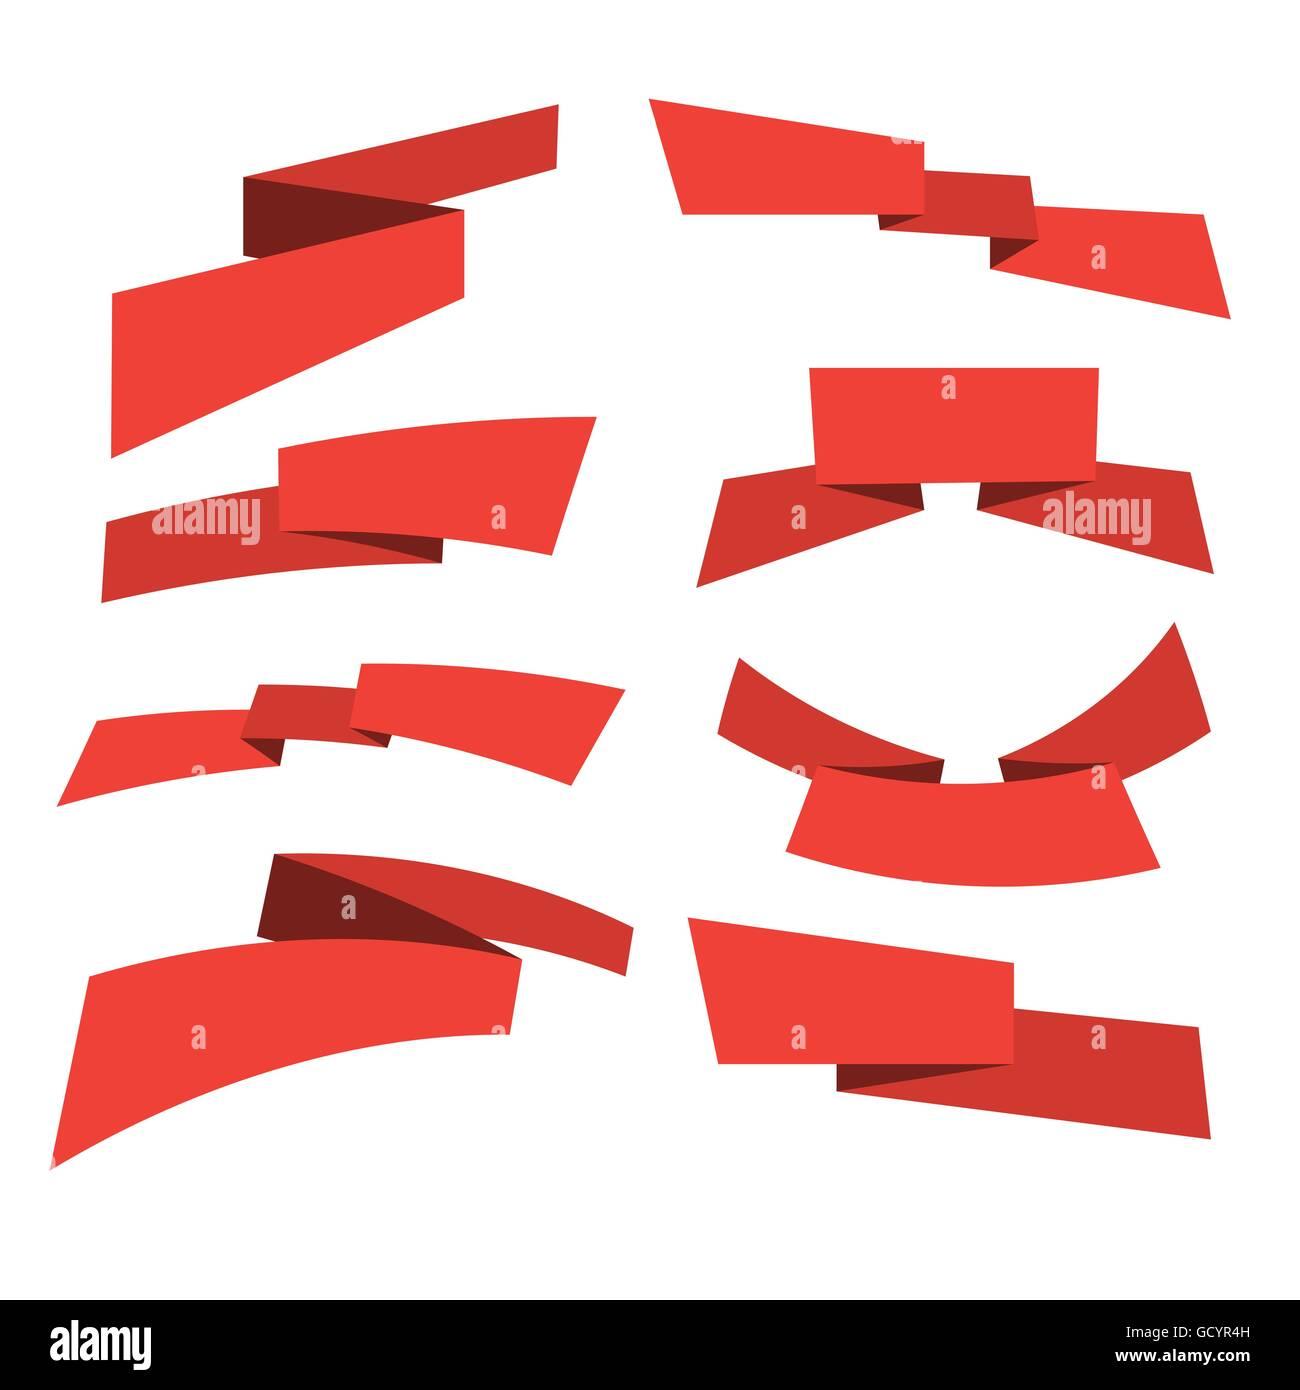 Design elements banner - Stock Vector Red Banner Ribbon Set Web Design Elements Vector Illustration